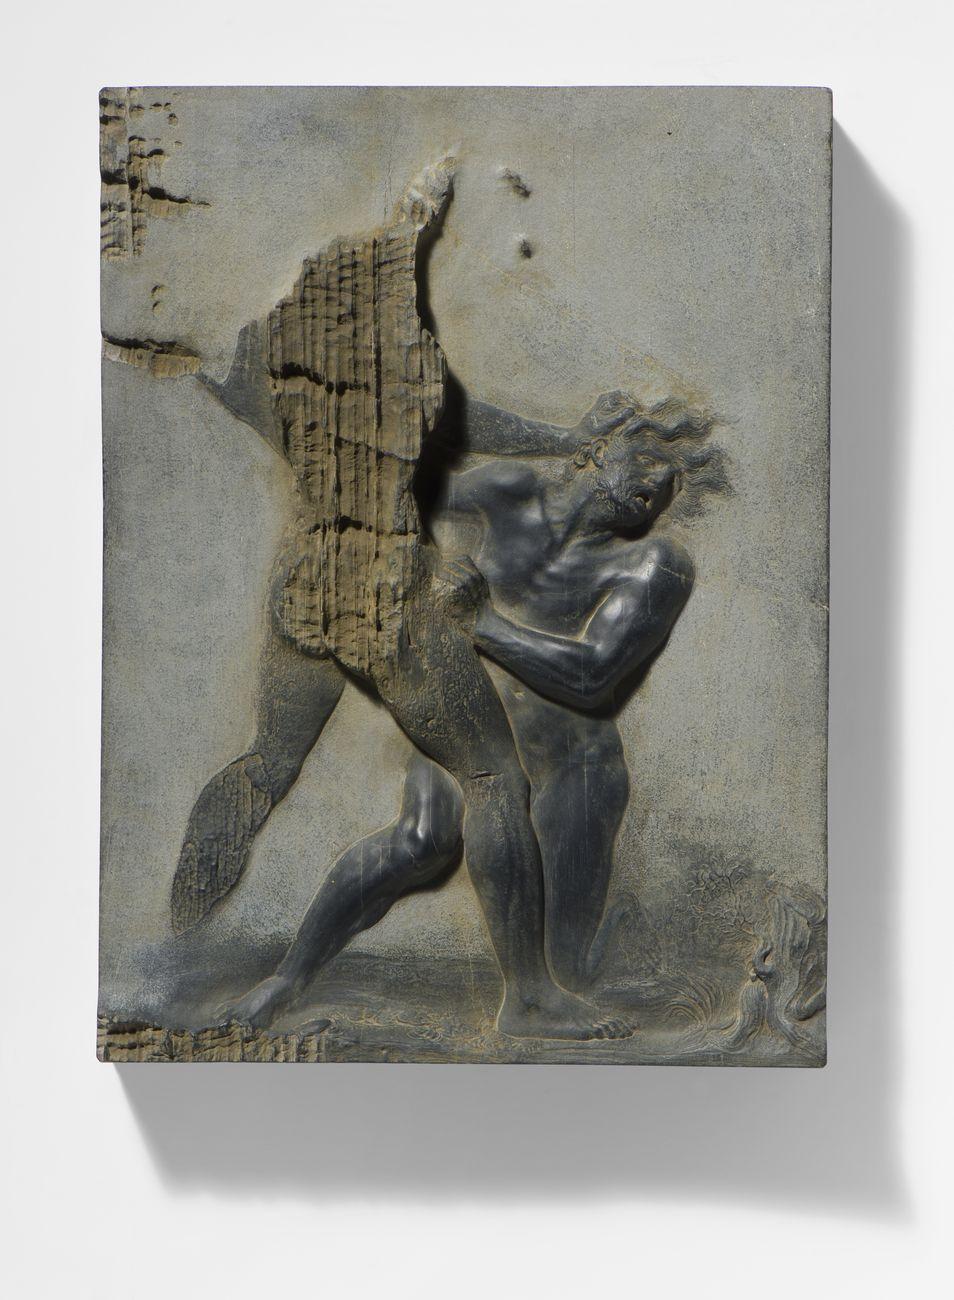 Nicola Samorì, Caina, 2018. Courtesy Galerie EIGEN + ART, Lipsia Berlino. Photo Rolando Paolo Guerzoni